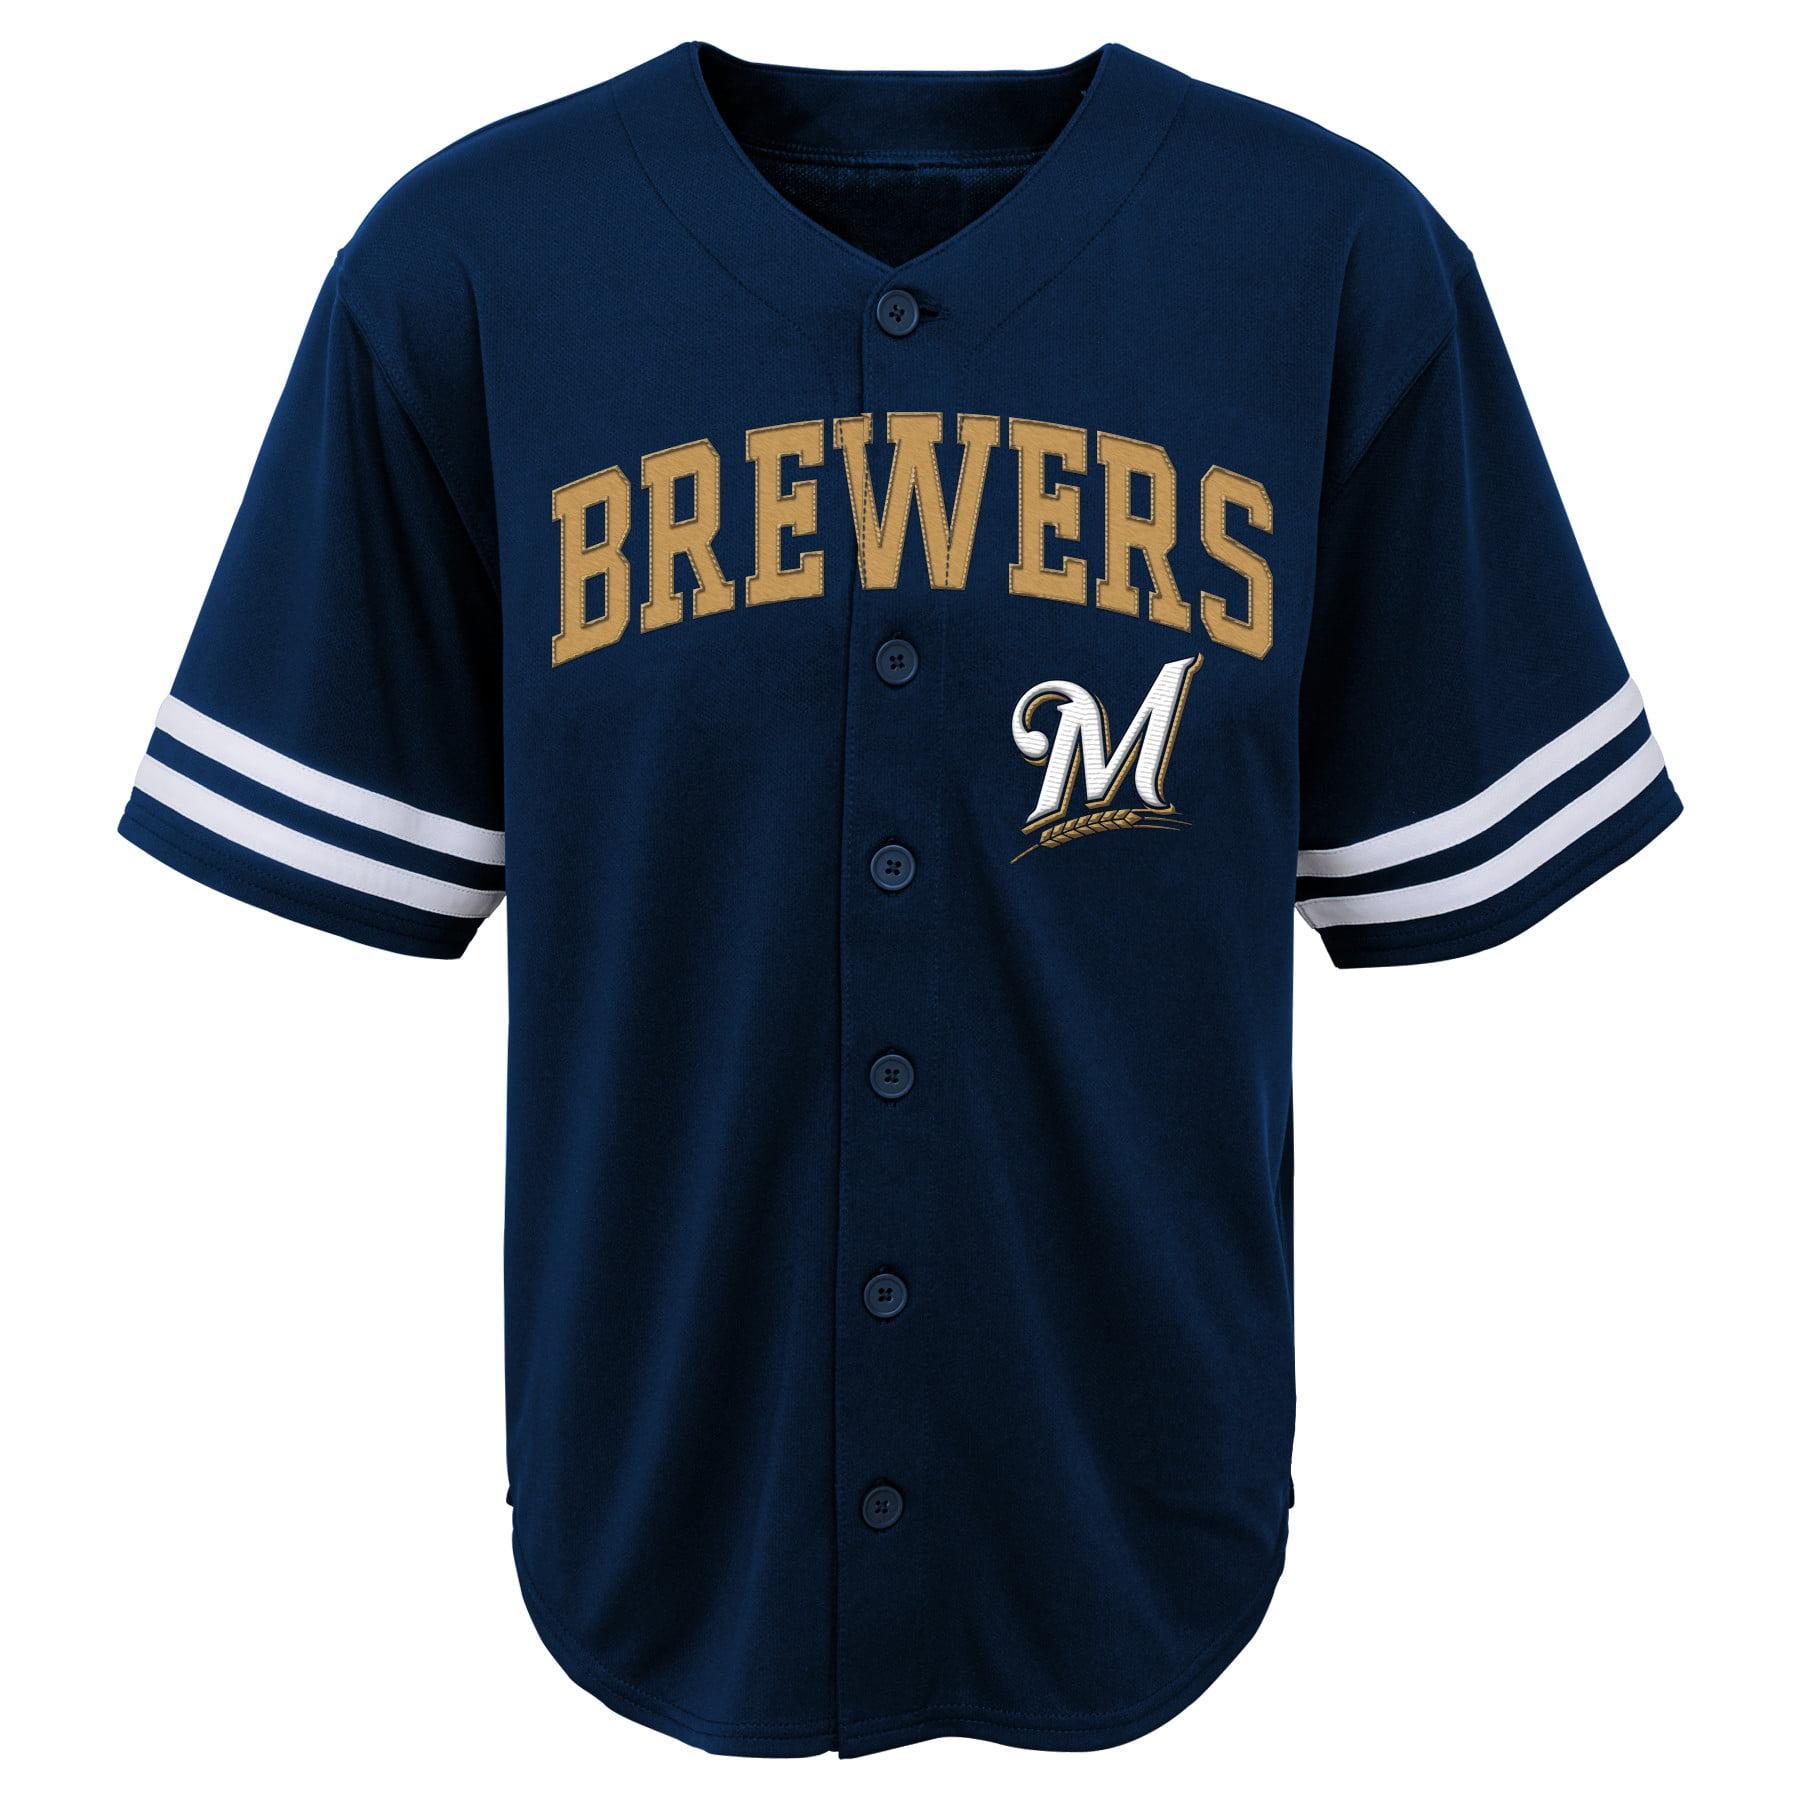 MLB Milwaukee BREWERS TEE Short Sleeve Boys Fashion Jersey Tee 60% Cotton 40% Polyester BLACK Team Tee 4-18